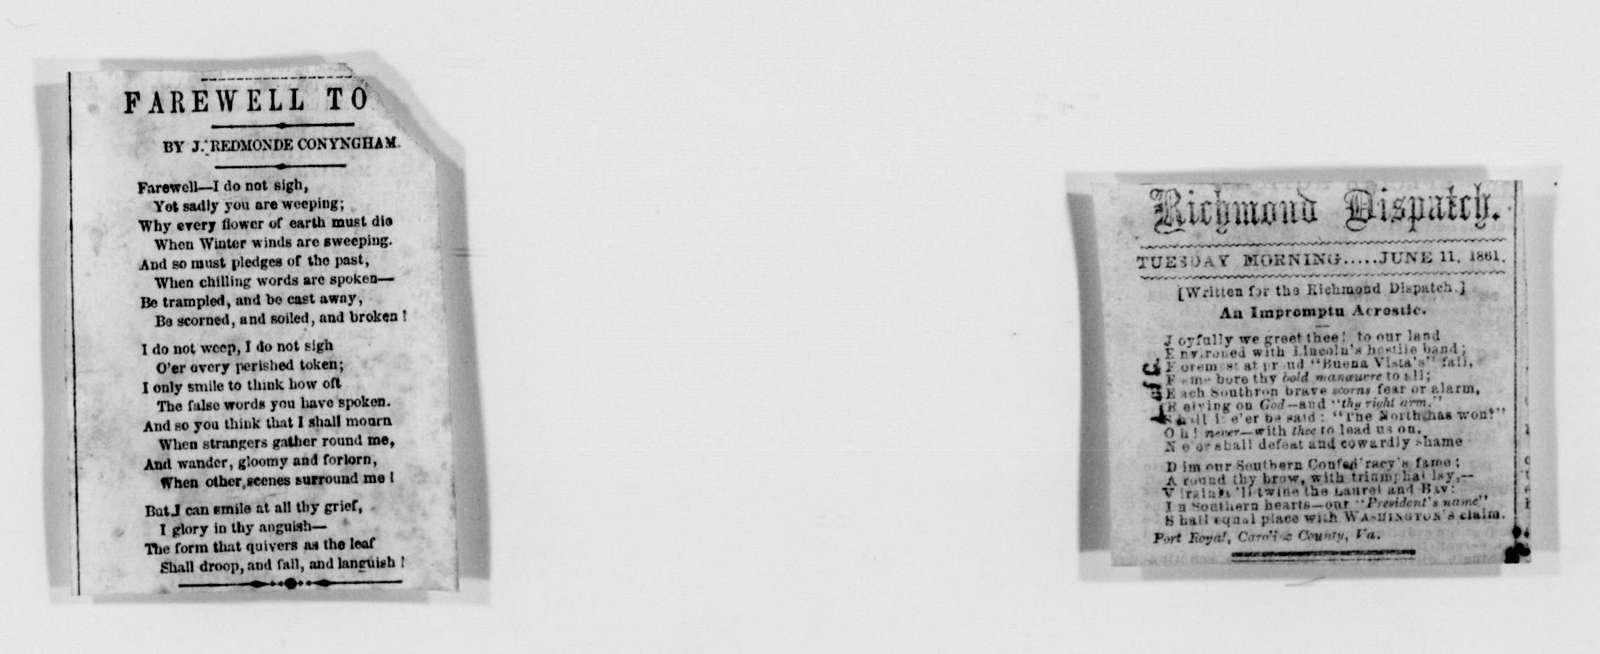 Confederate States of America records: Microfilm Reel 27